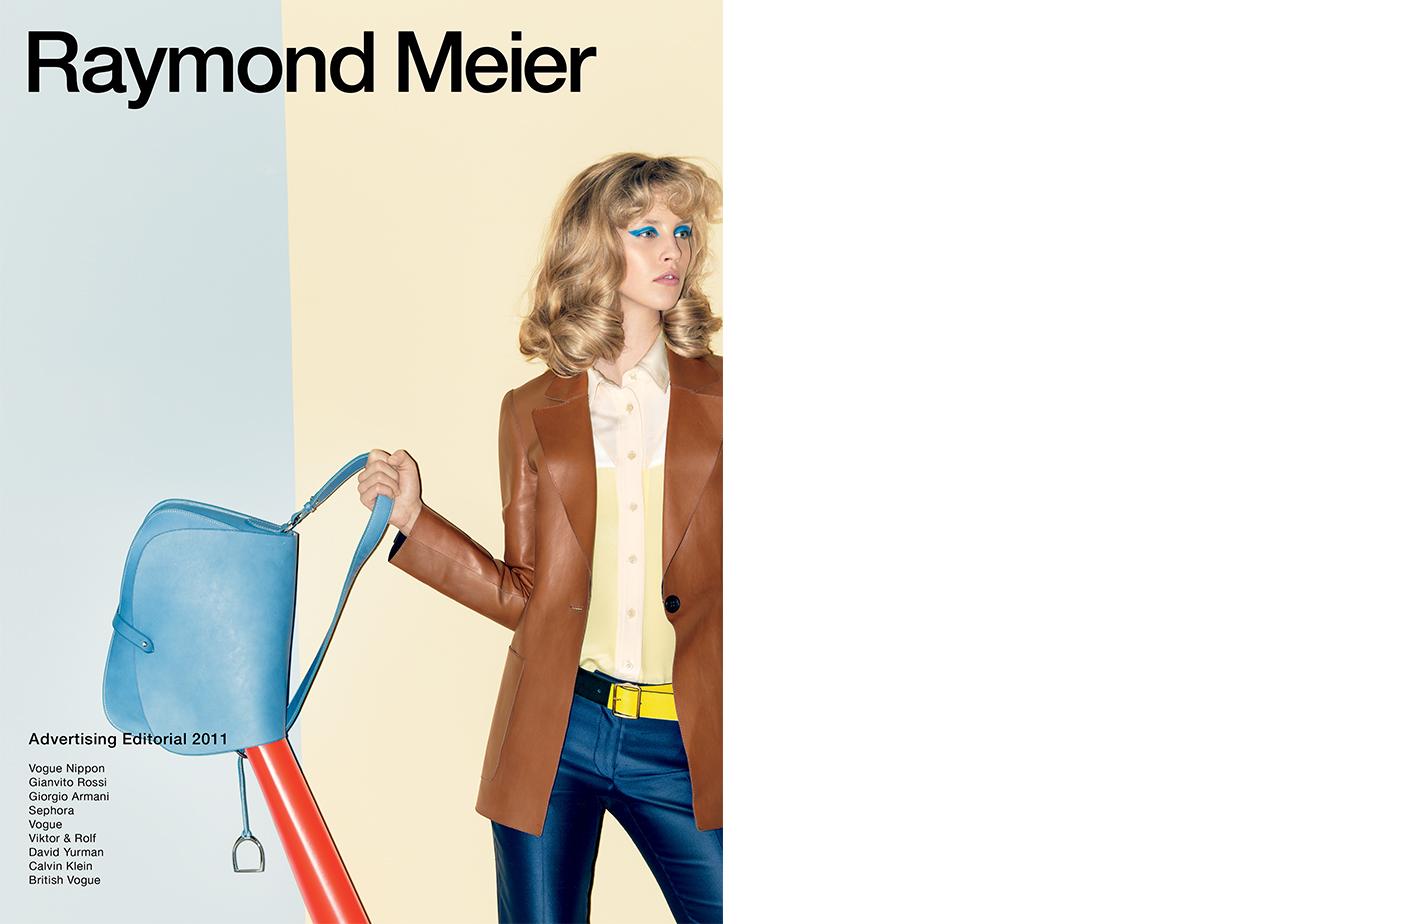 Advertising Editorial 2011